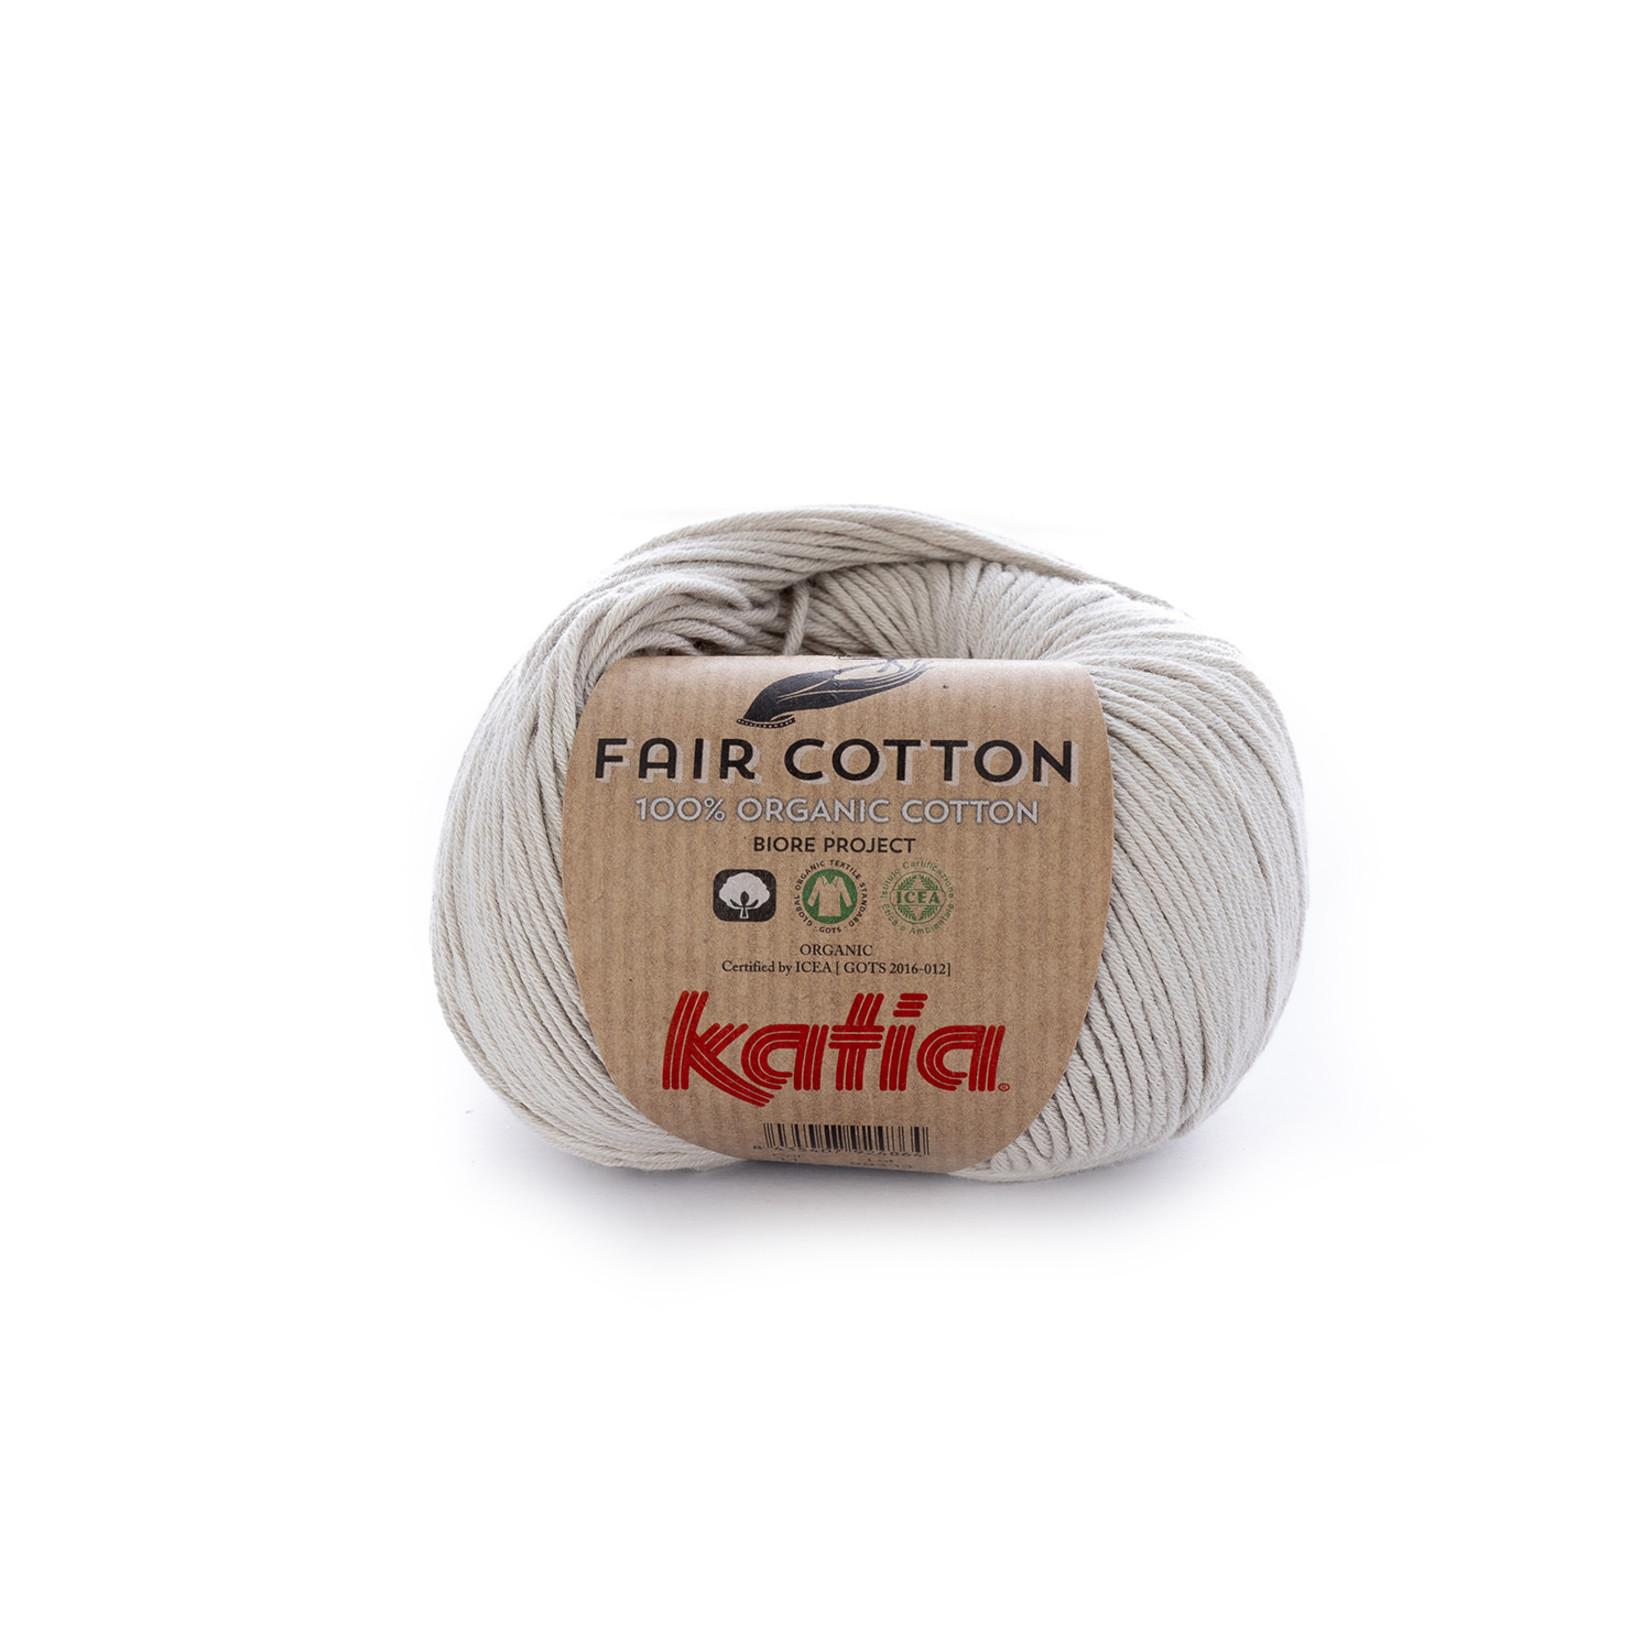 Katia Katia Fair Cotton 11 - parelmoer - lichtgrijs - 1 bol = 50 gr. = 155 m. - 100% biol. katoen